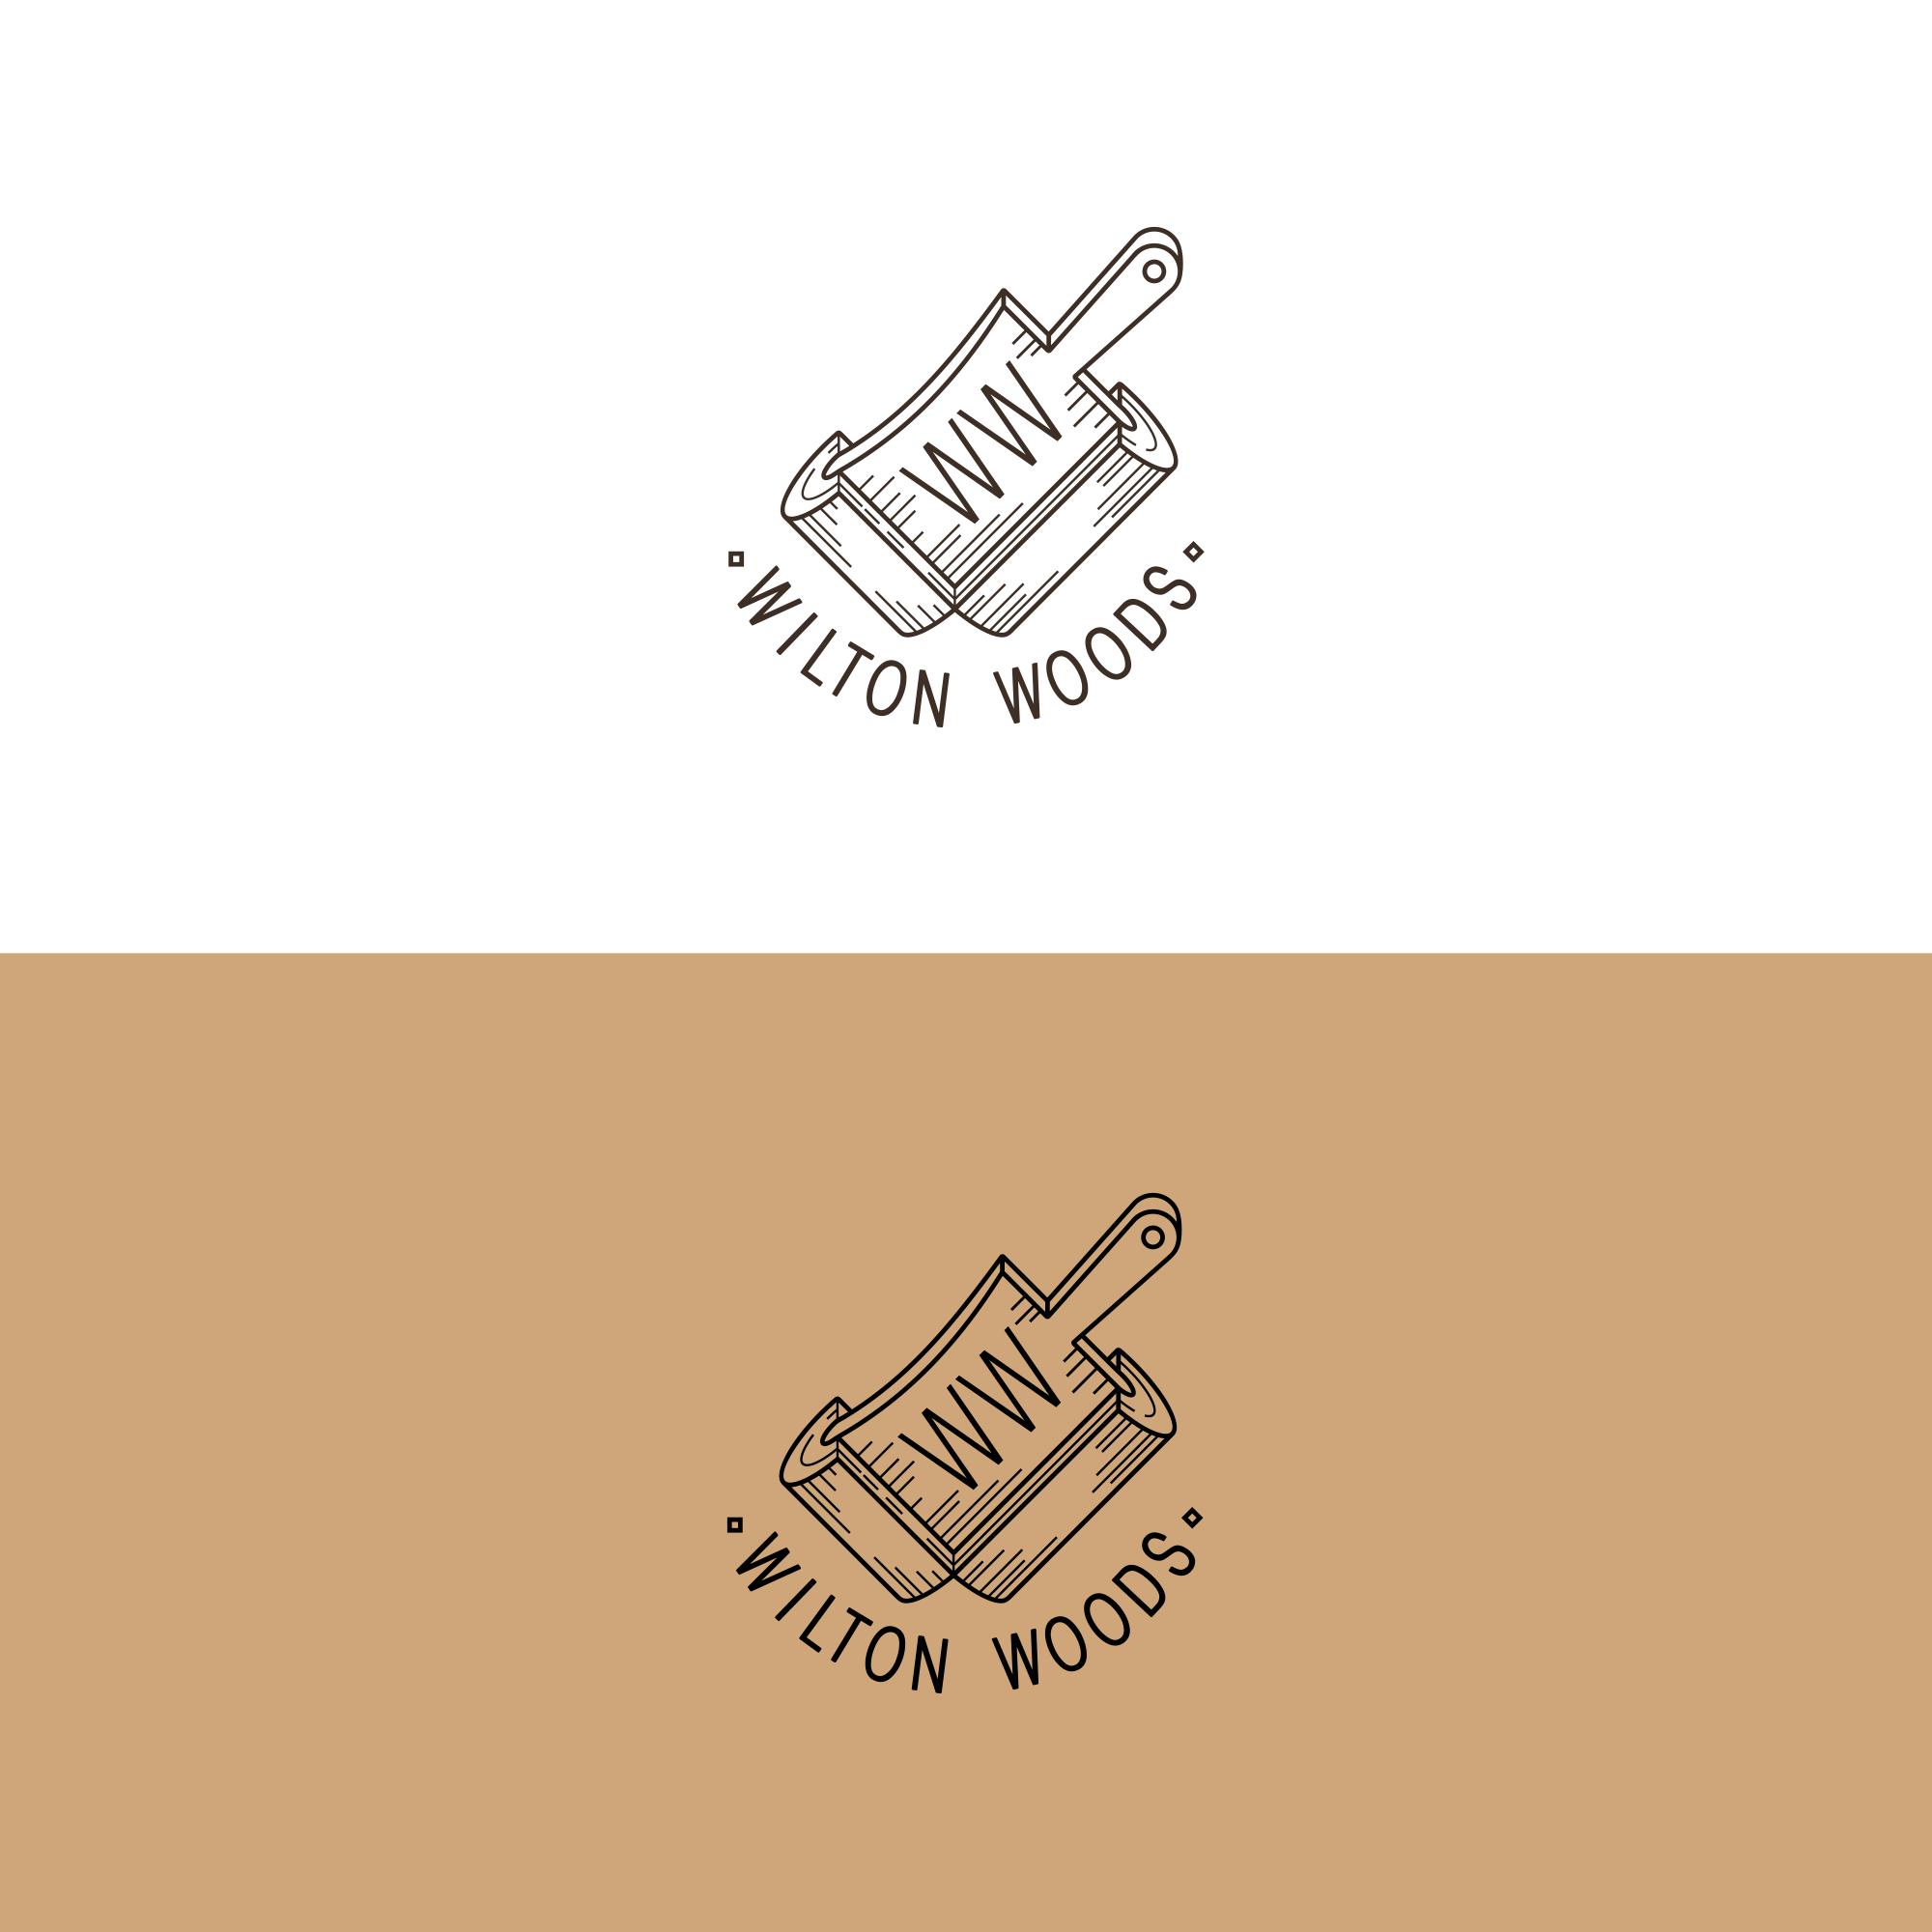 Wilton Wood 002